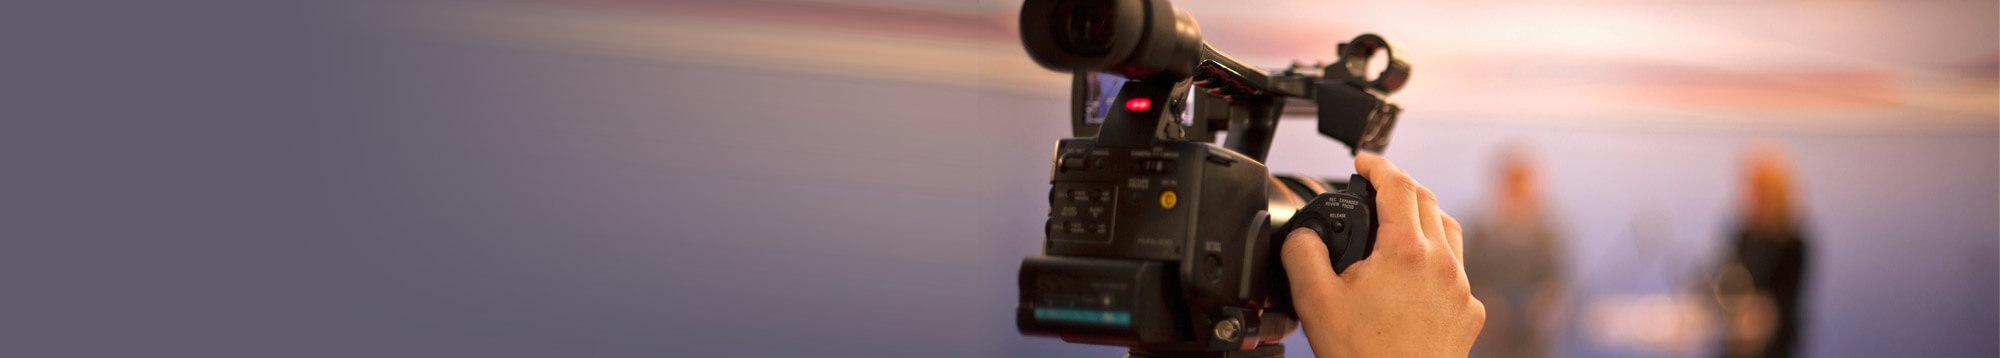 High Quality HD Marketing Videos - Affordably Priced